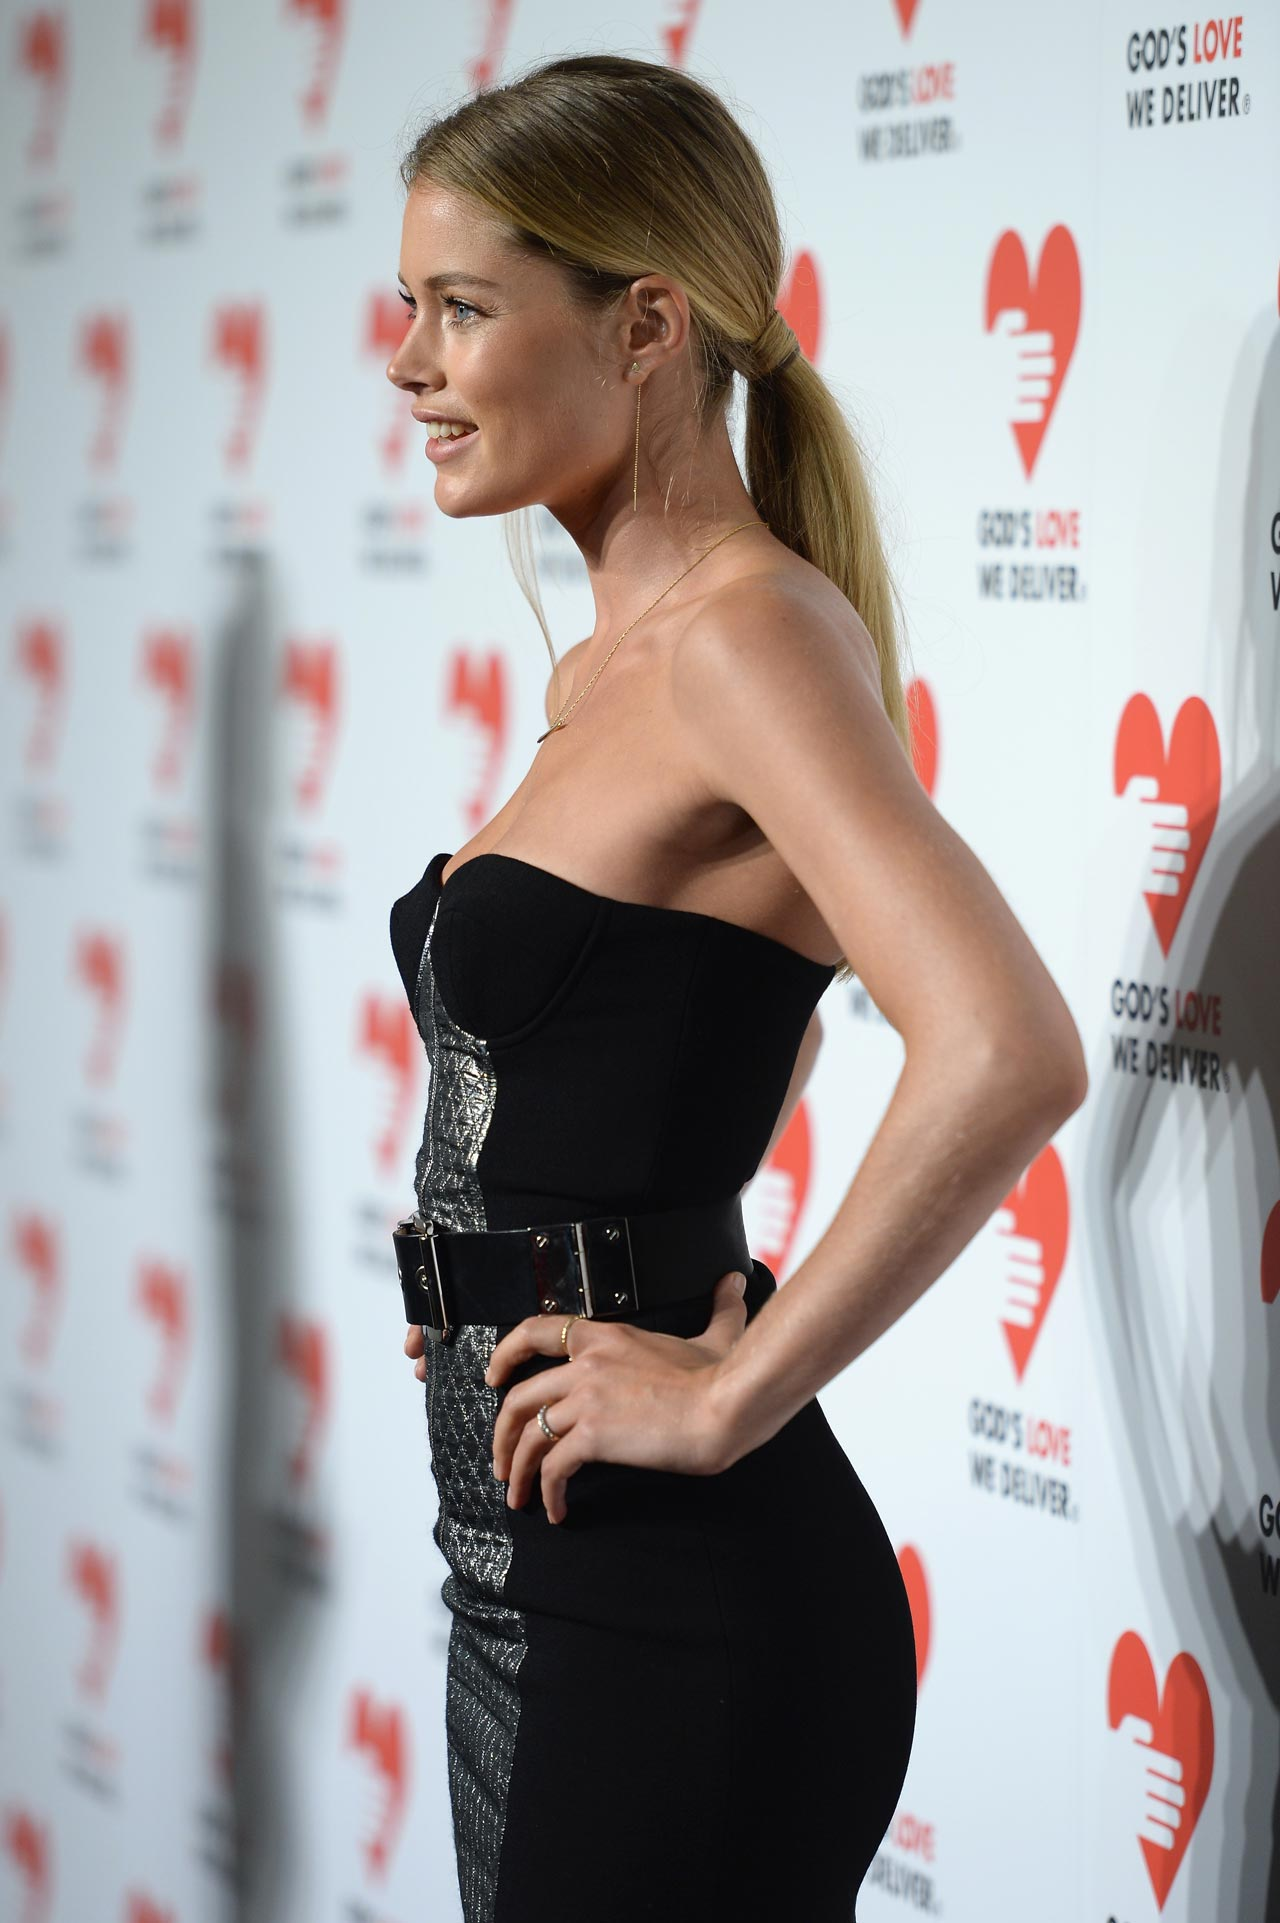 Doutzen Kroes On Red Carpet 2013 Golden Heart Awards